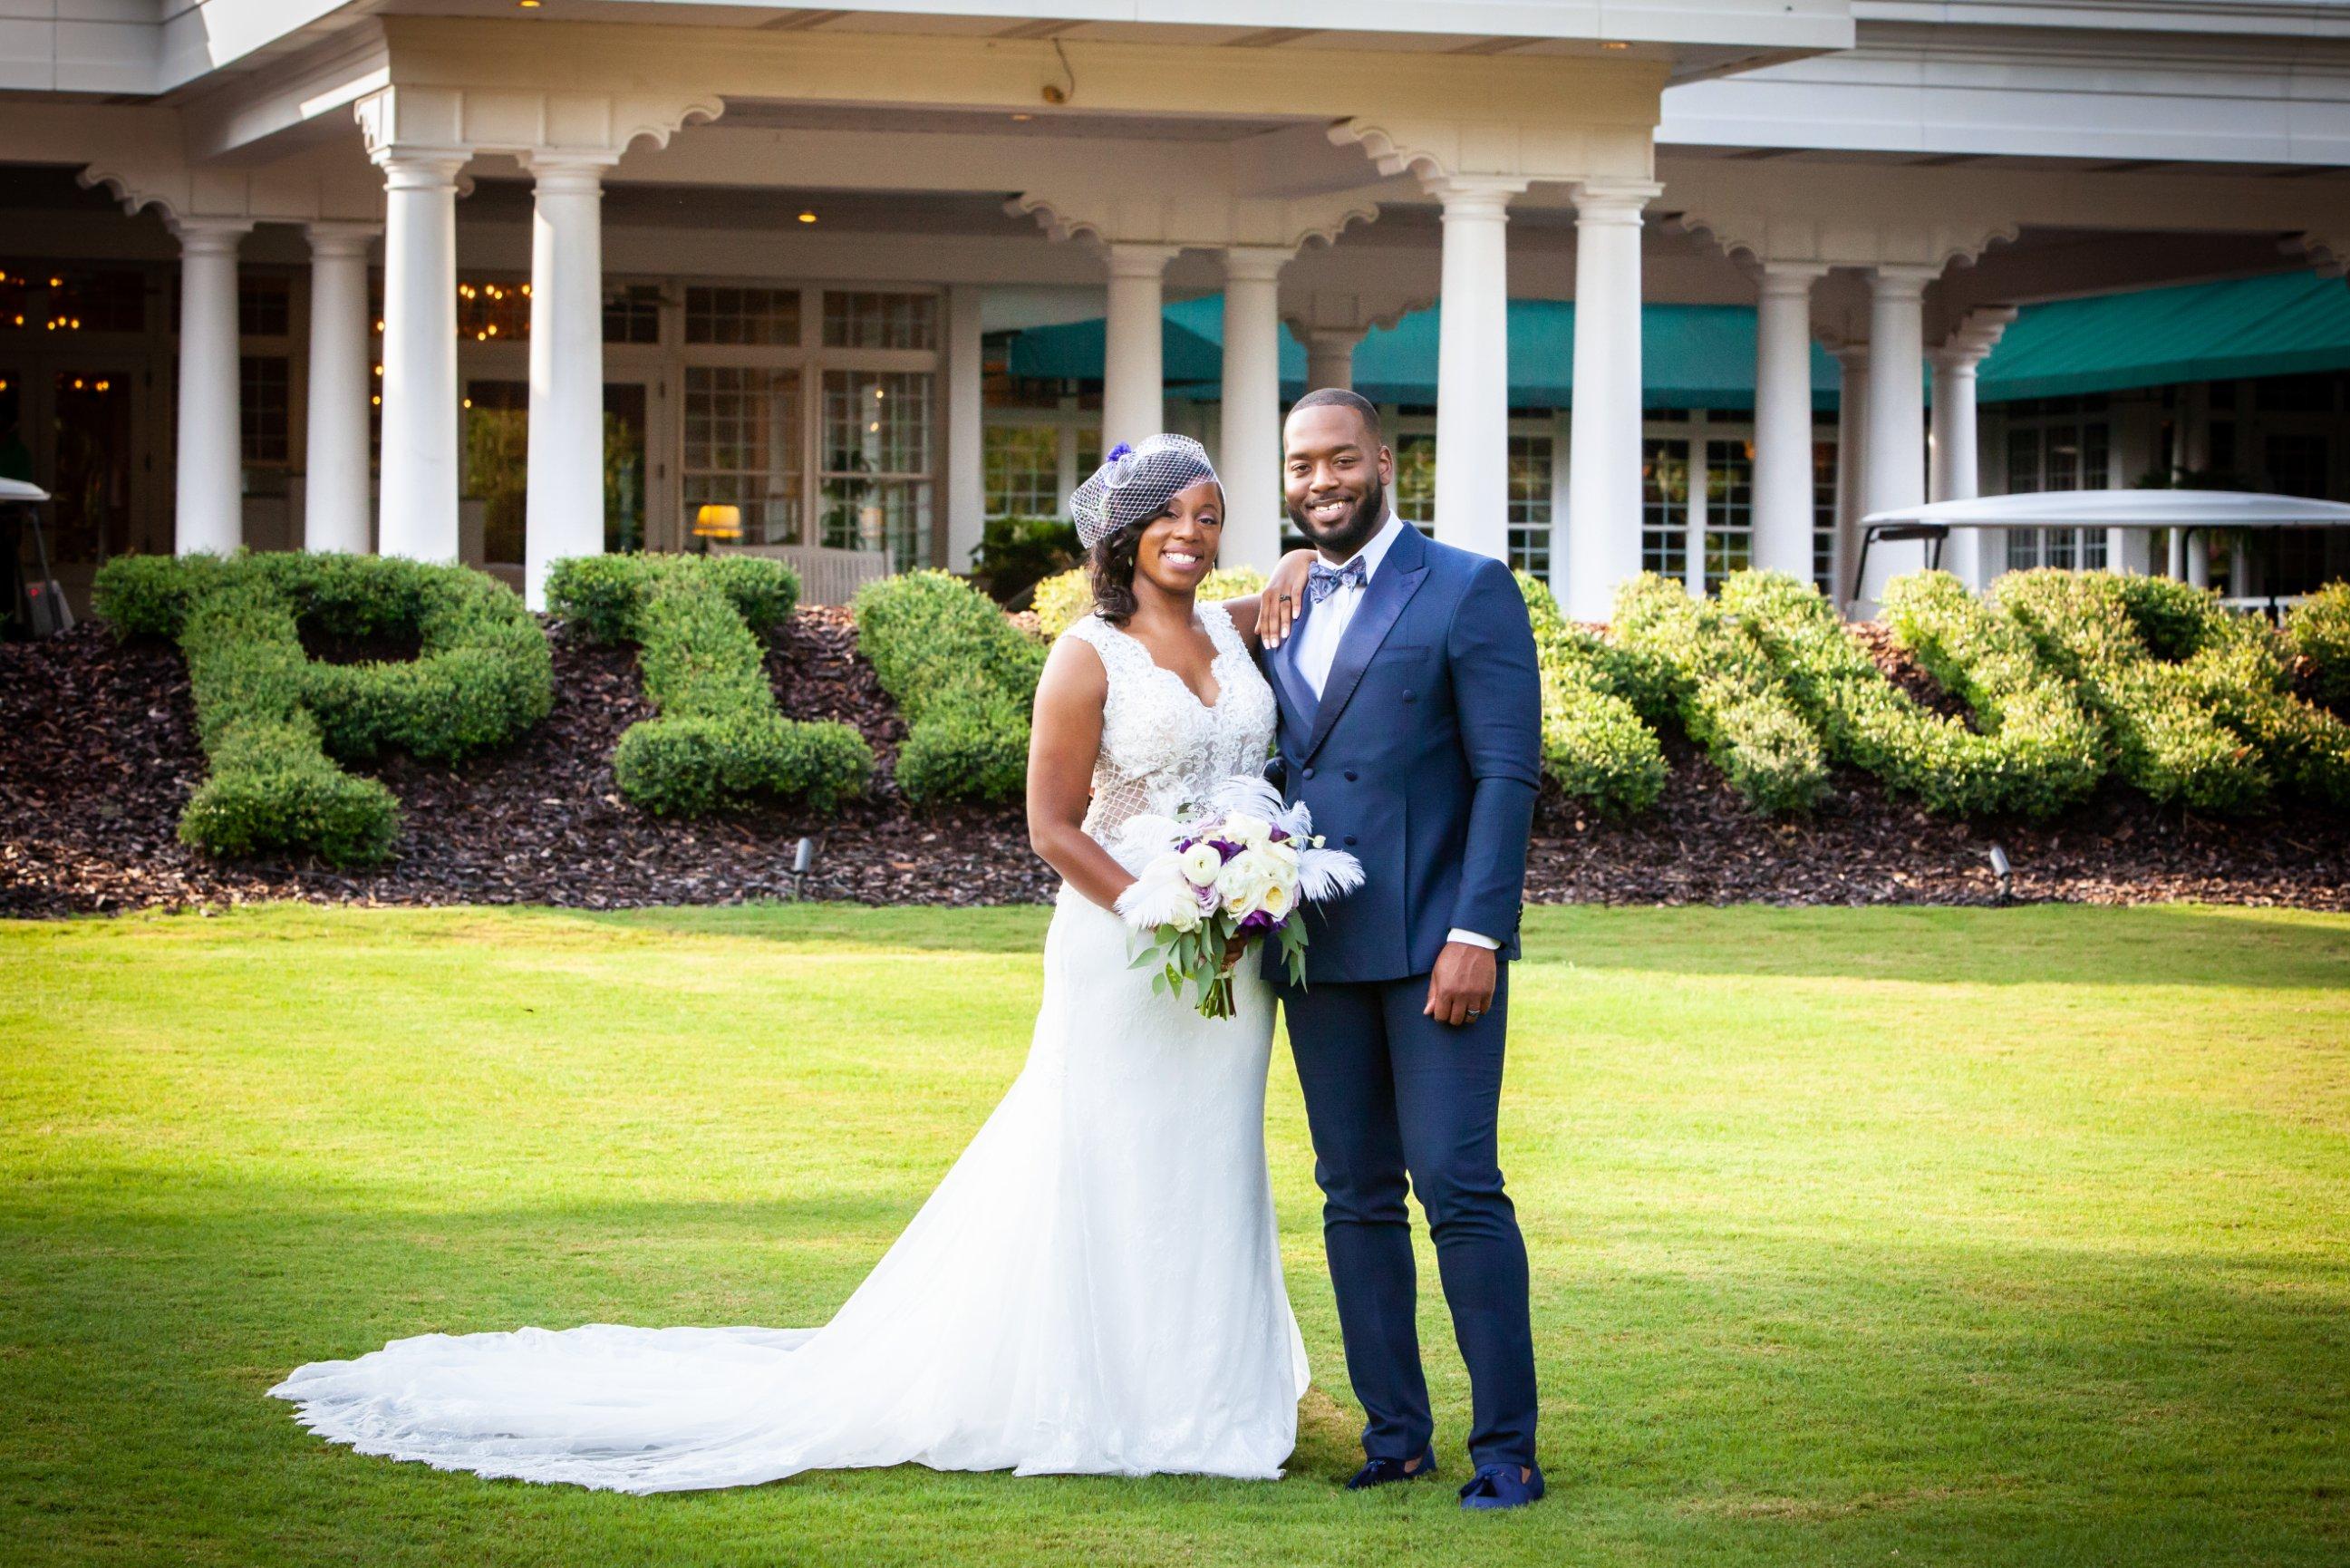 Wedding Celebration At The Historic Pinehurst Resort Country Club